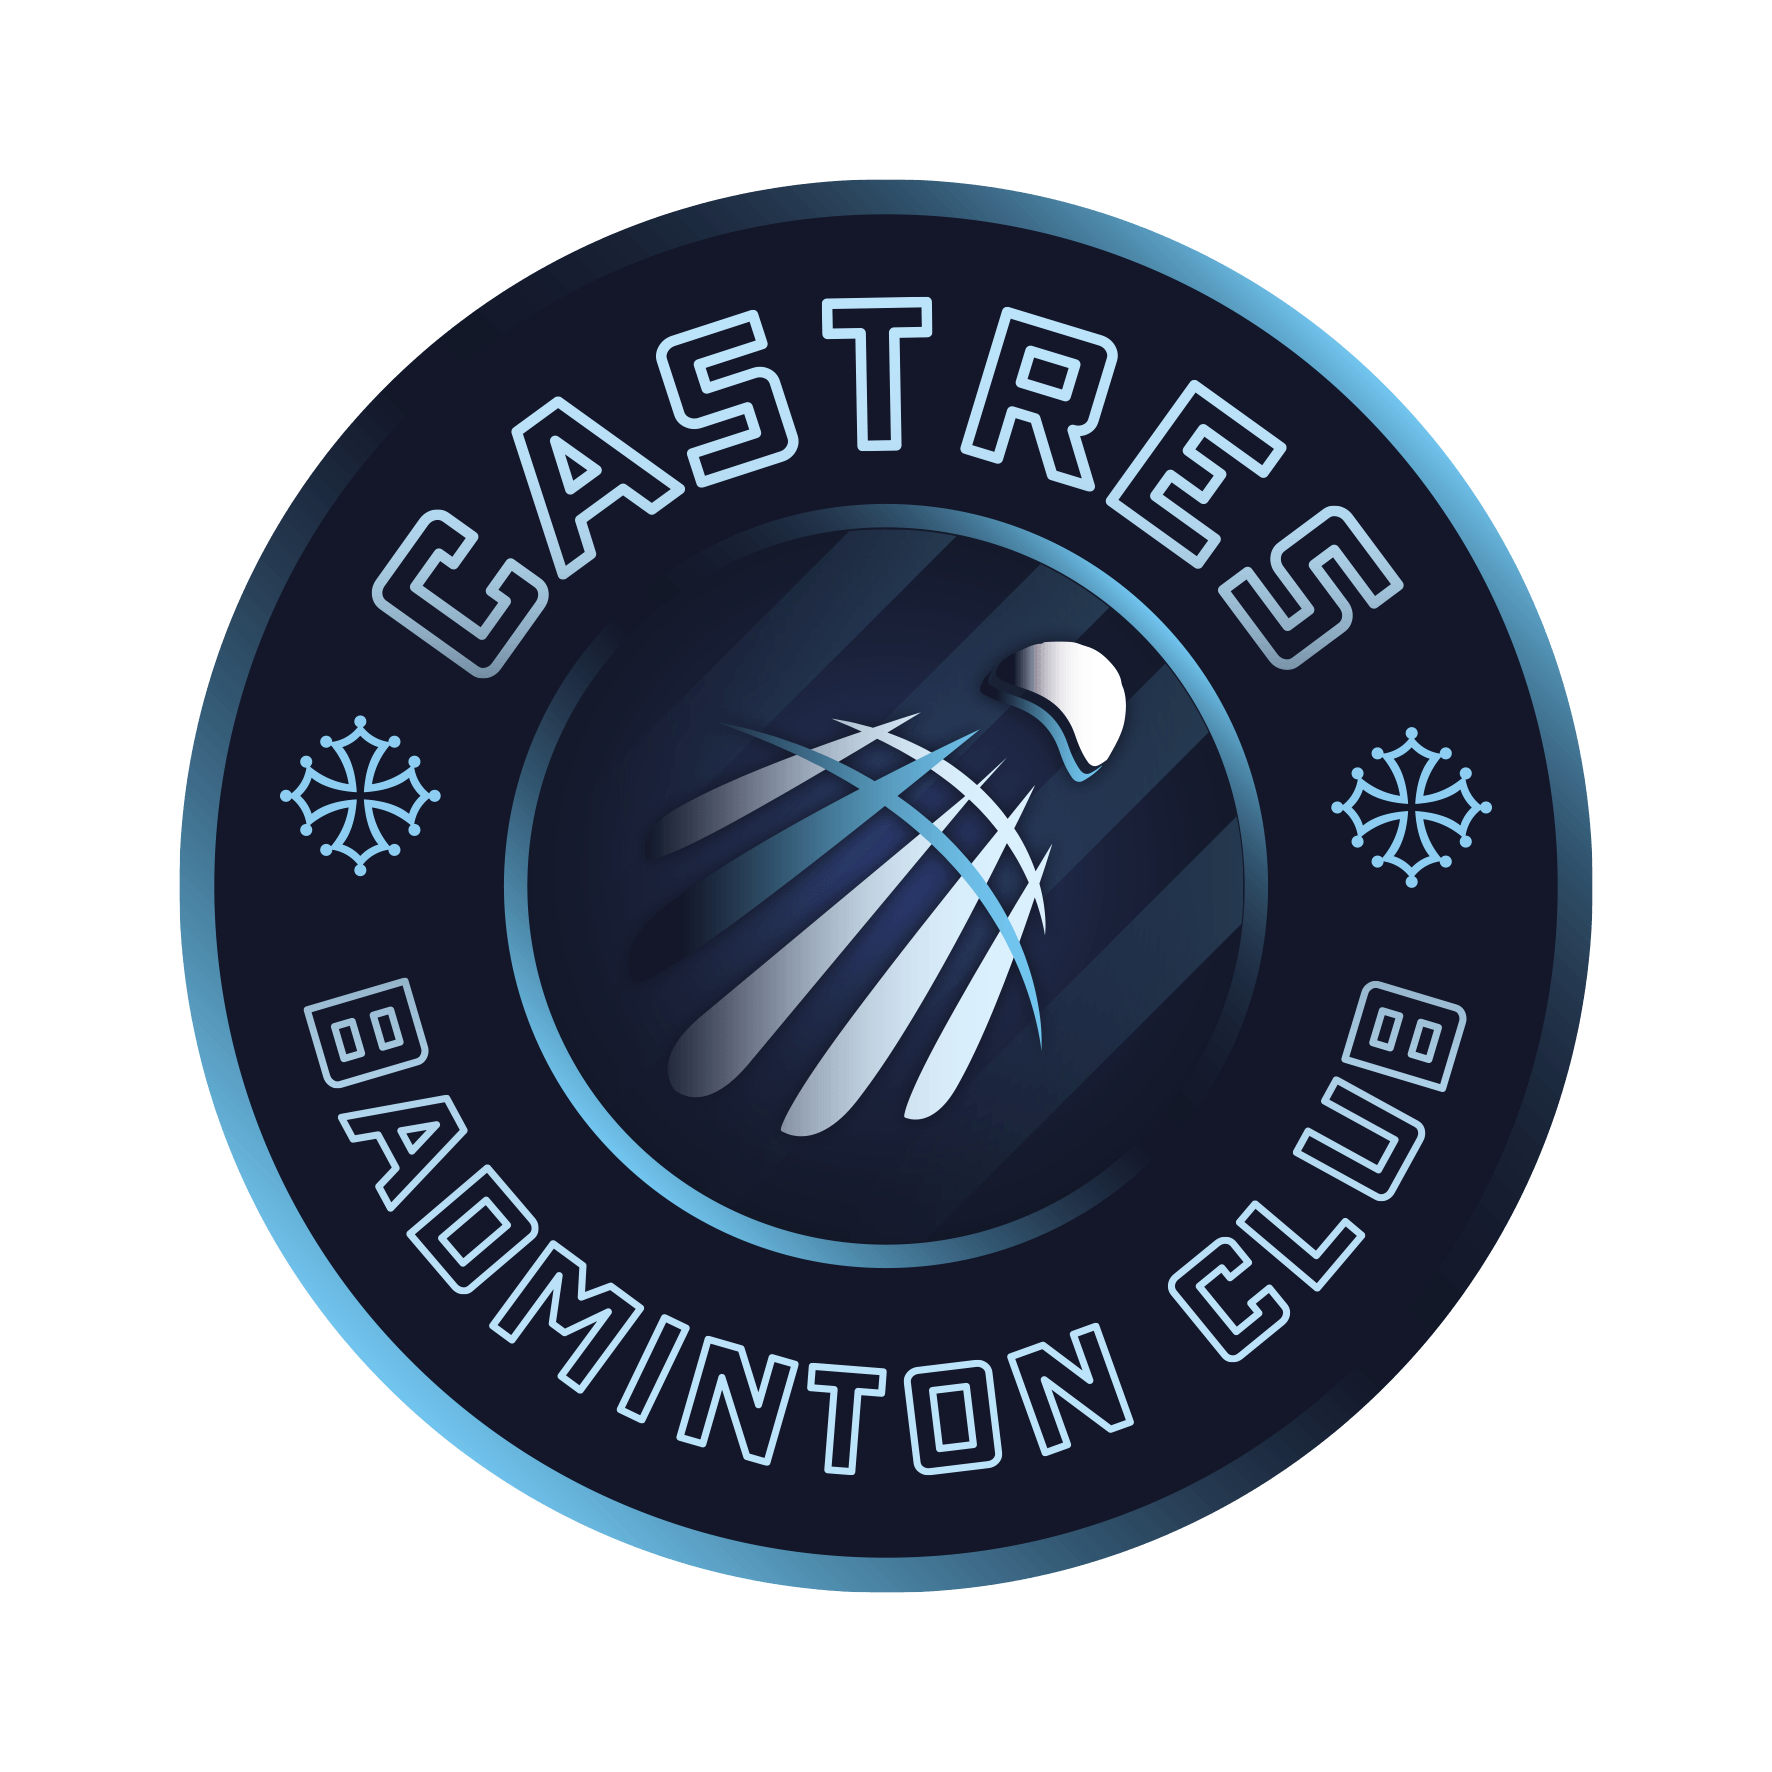 Castres Badminton Club